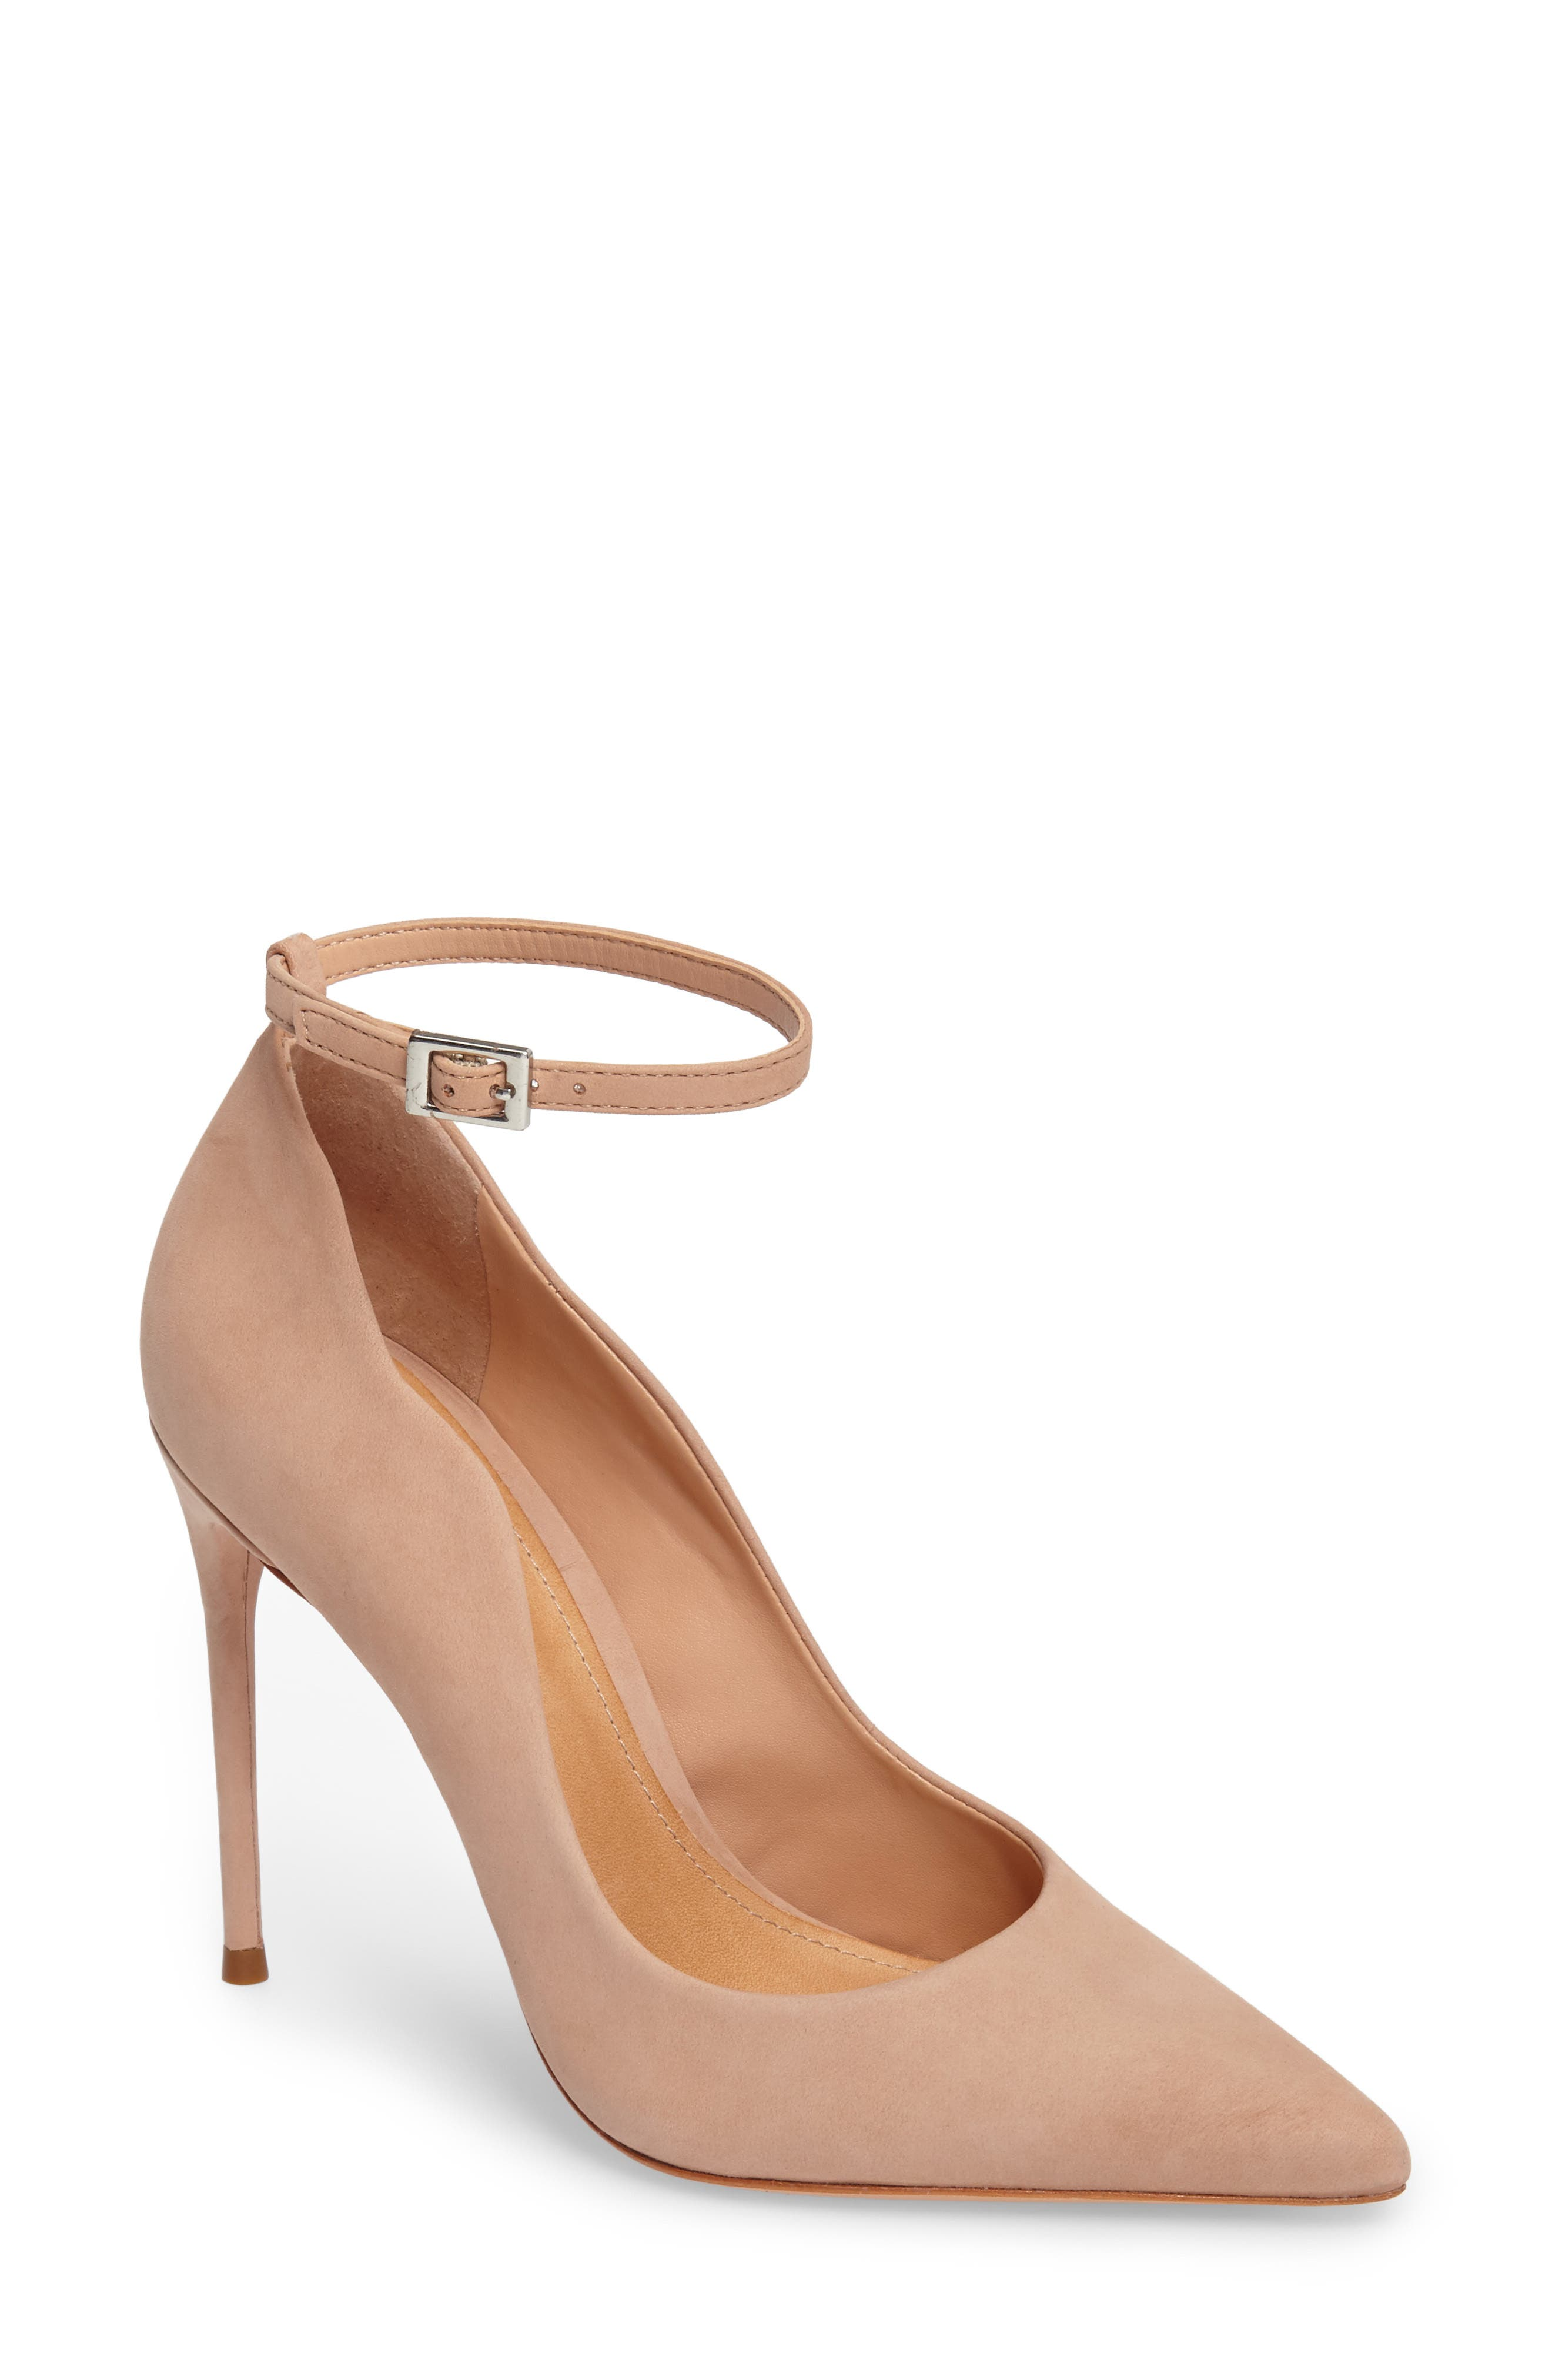 Schutz Women's Thaynara Leather Ankle Strap Pointed Toe Pumps FUNJXFi